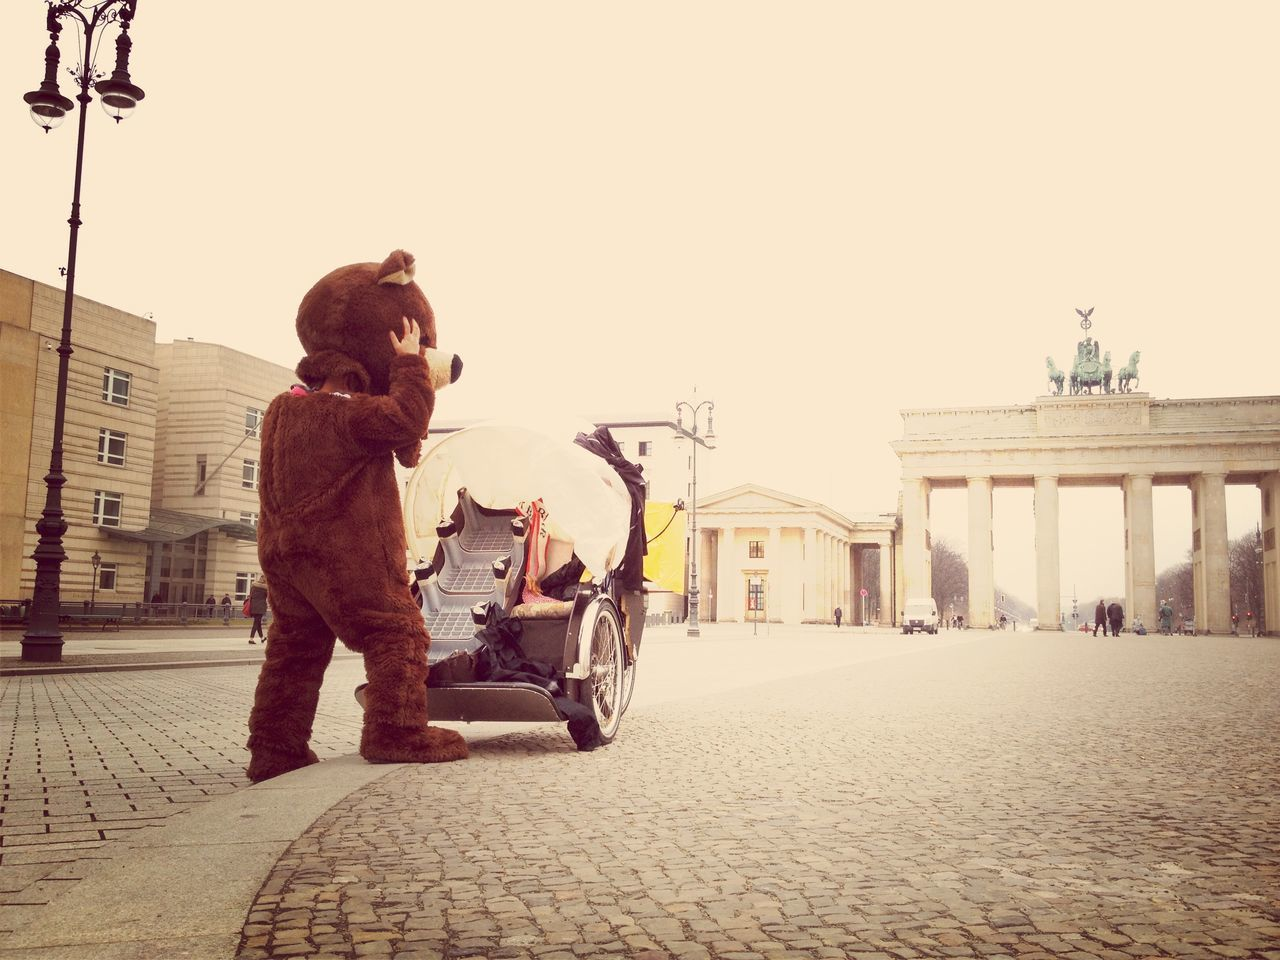 Person in bear costume in front of pariser platz